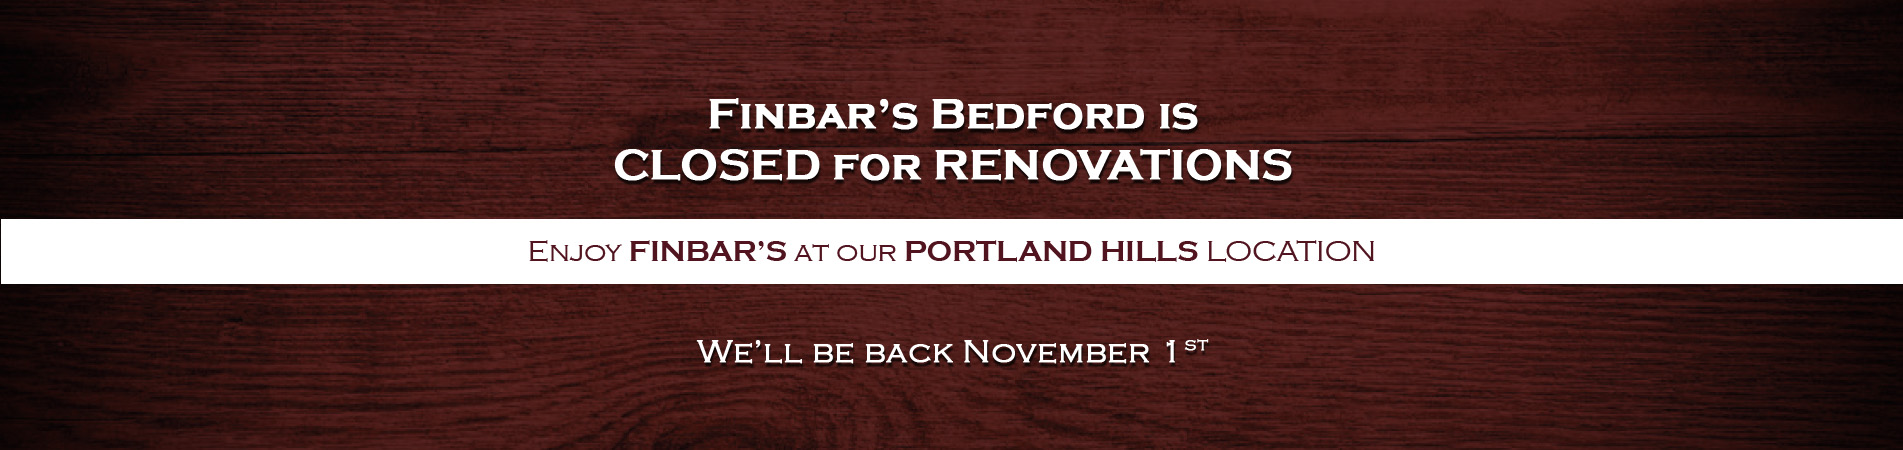 Finbar's Bedford is closed for renovations. Enjoy Finbar's at our Portland Hills location. We'll be back November 1st.